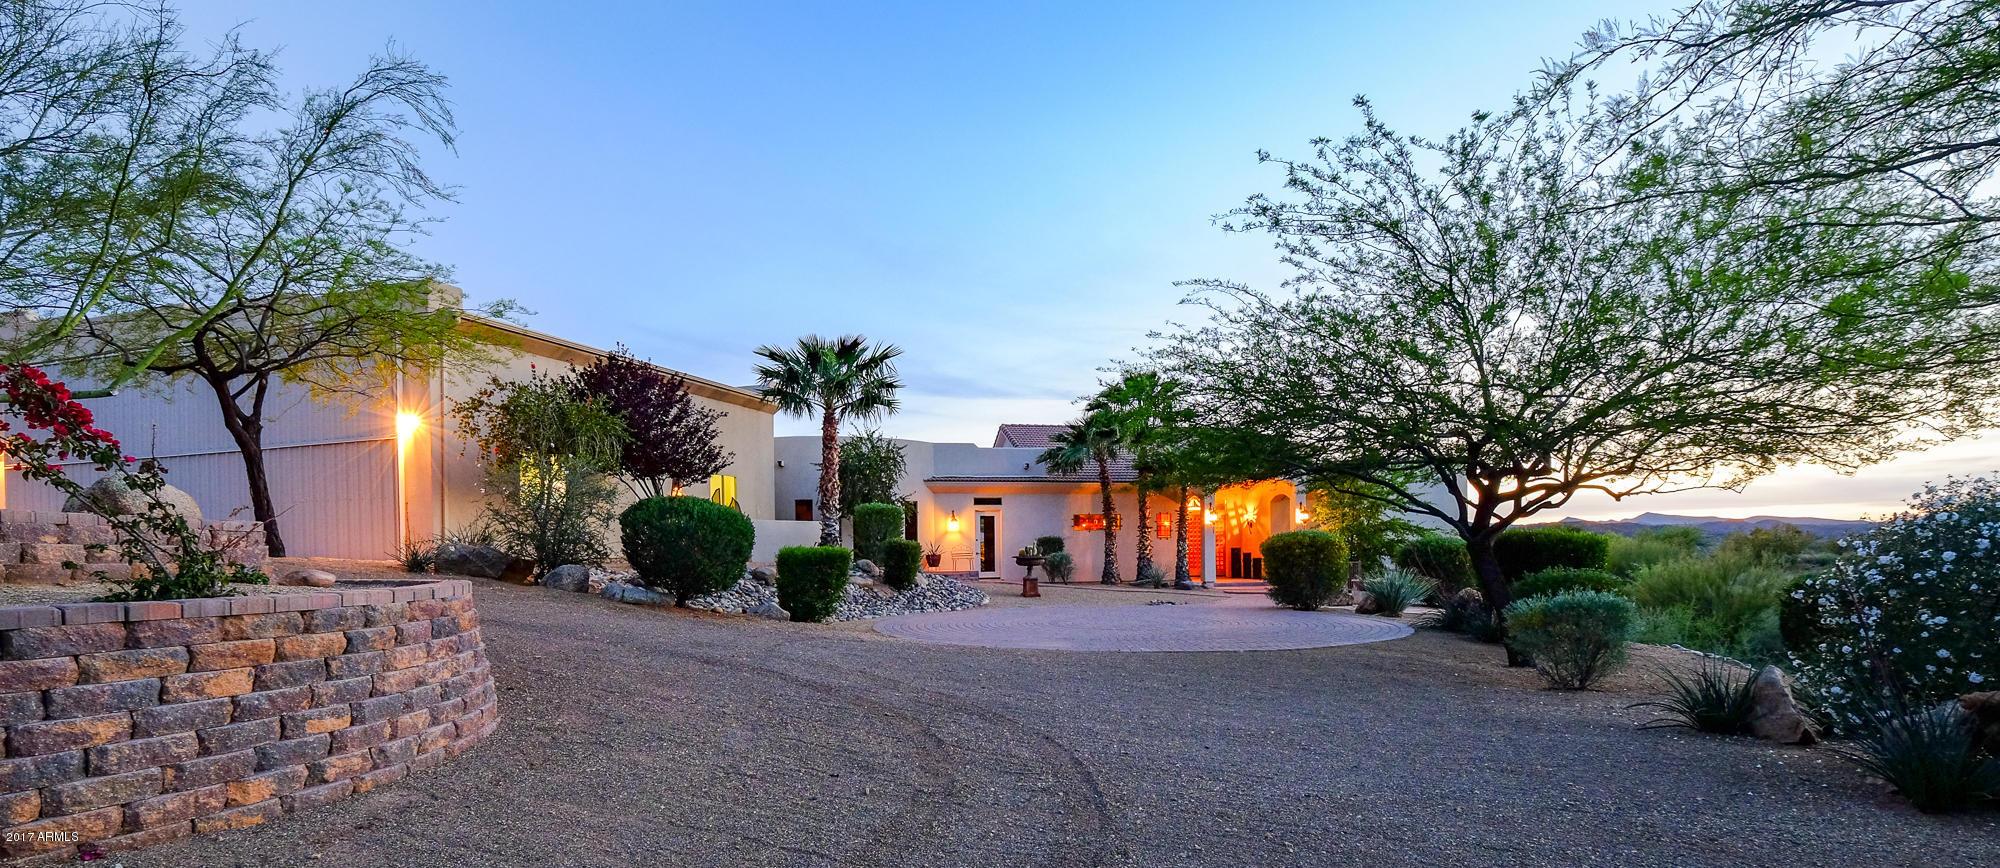 MLS 5594607 51313 N 293RD Avenue, Wickenburg, AZ 85390 Wickenburg AZ One Plus Acre Home